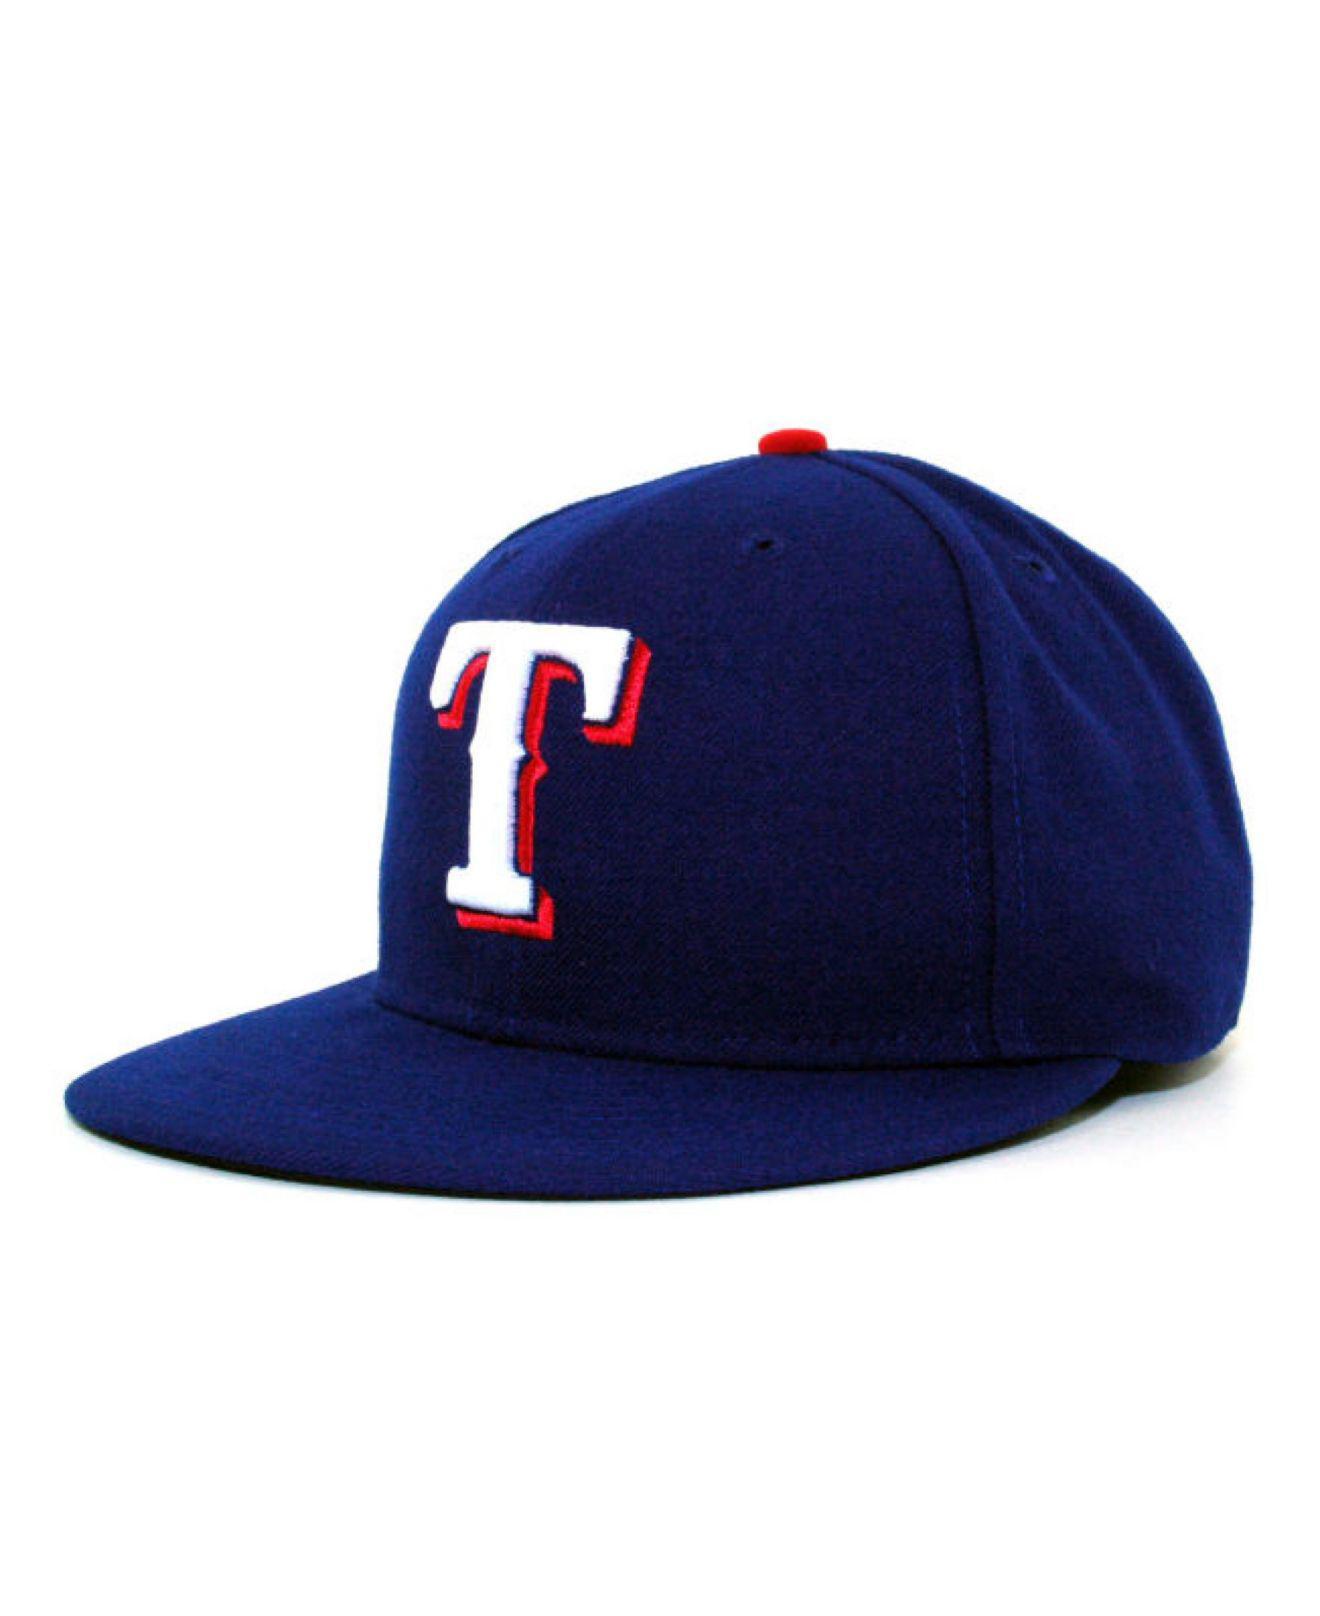 best website 1b0b3 ced46 KTZ. Men s Blue Texas Rangers Mlb Authentic Collection 59fifty Cap